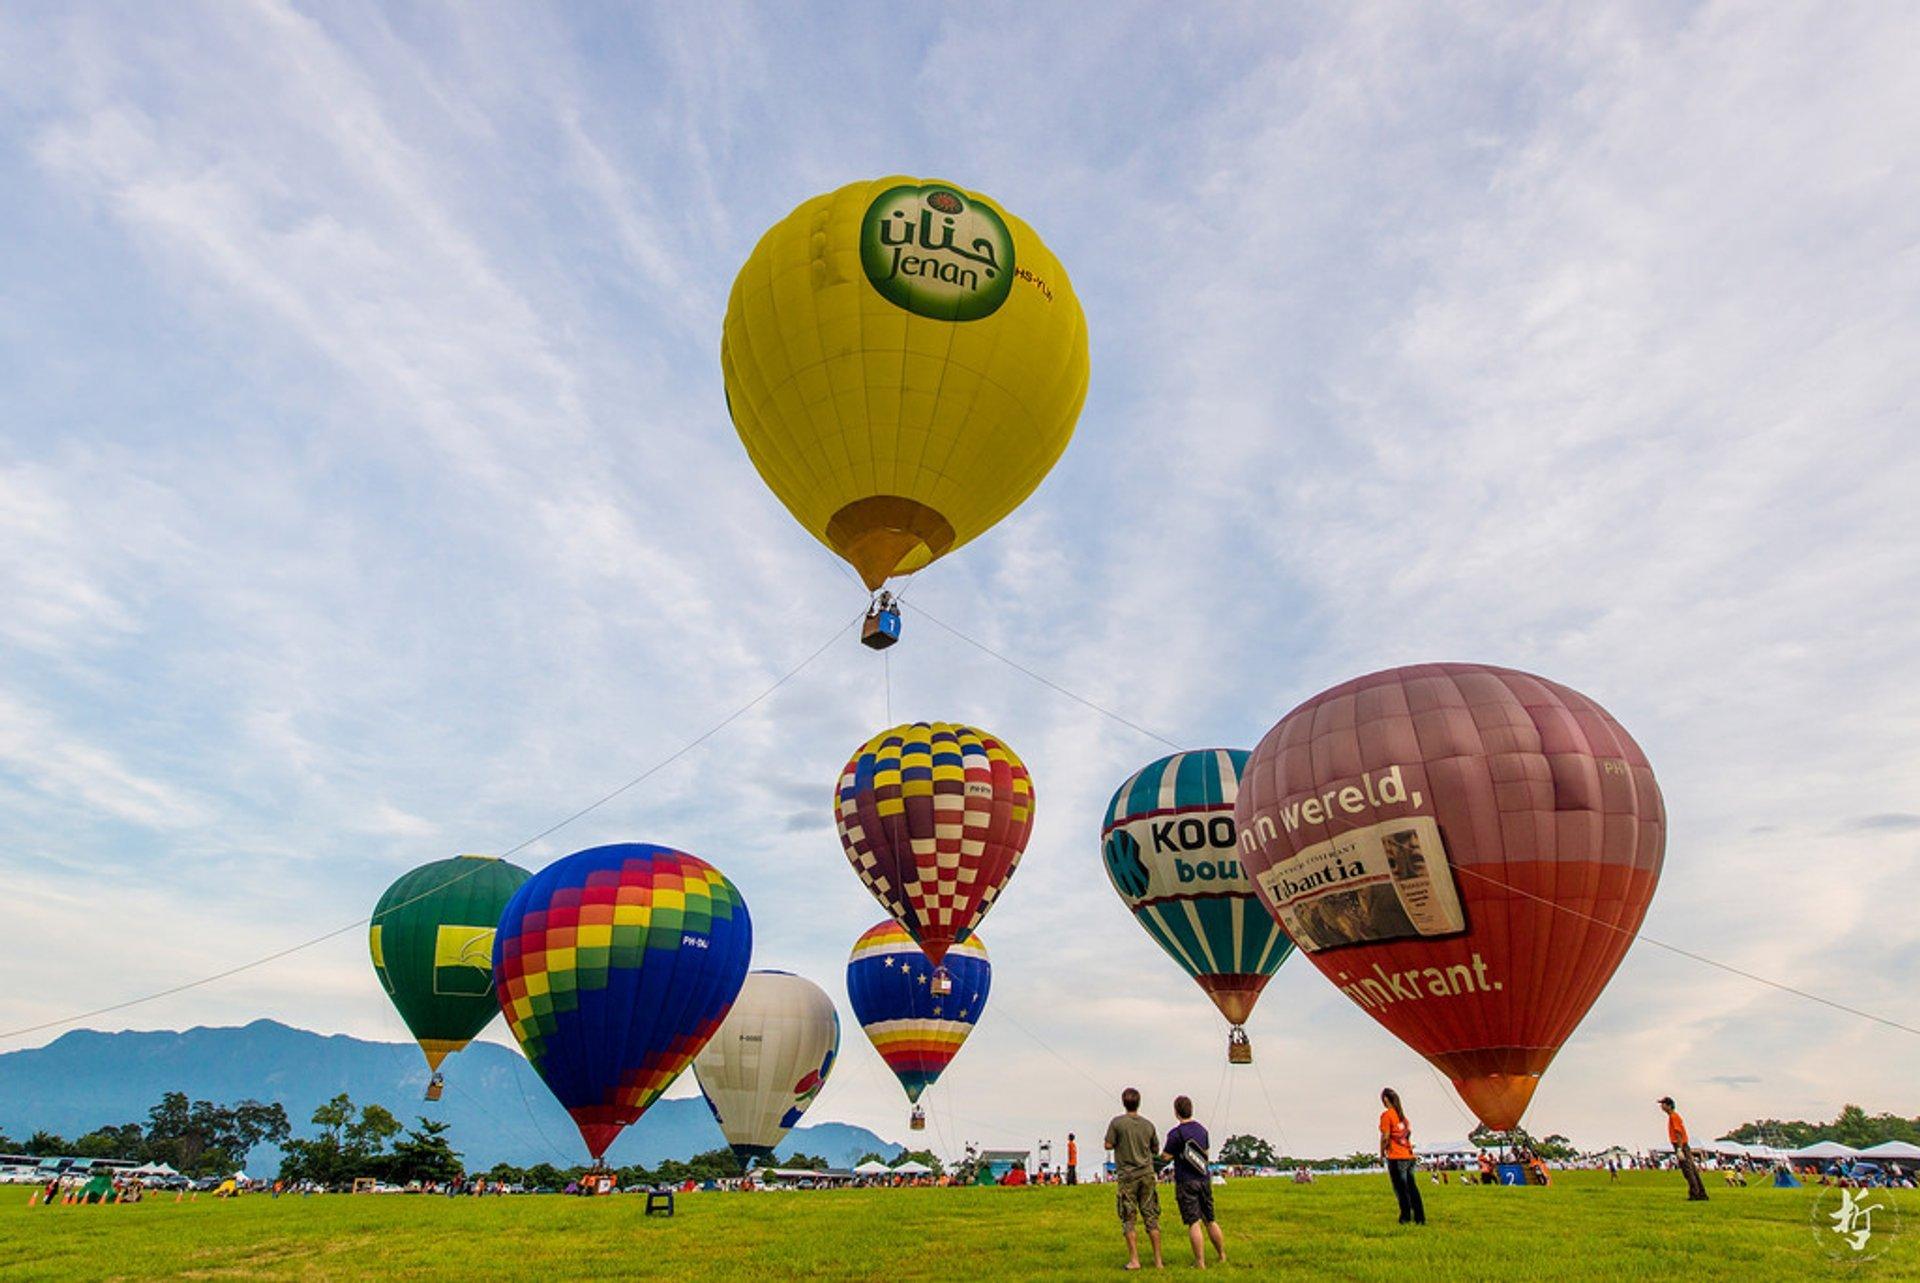 Taiwan Balloon Festival in Taiwan - Best Season 2019